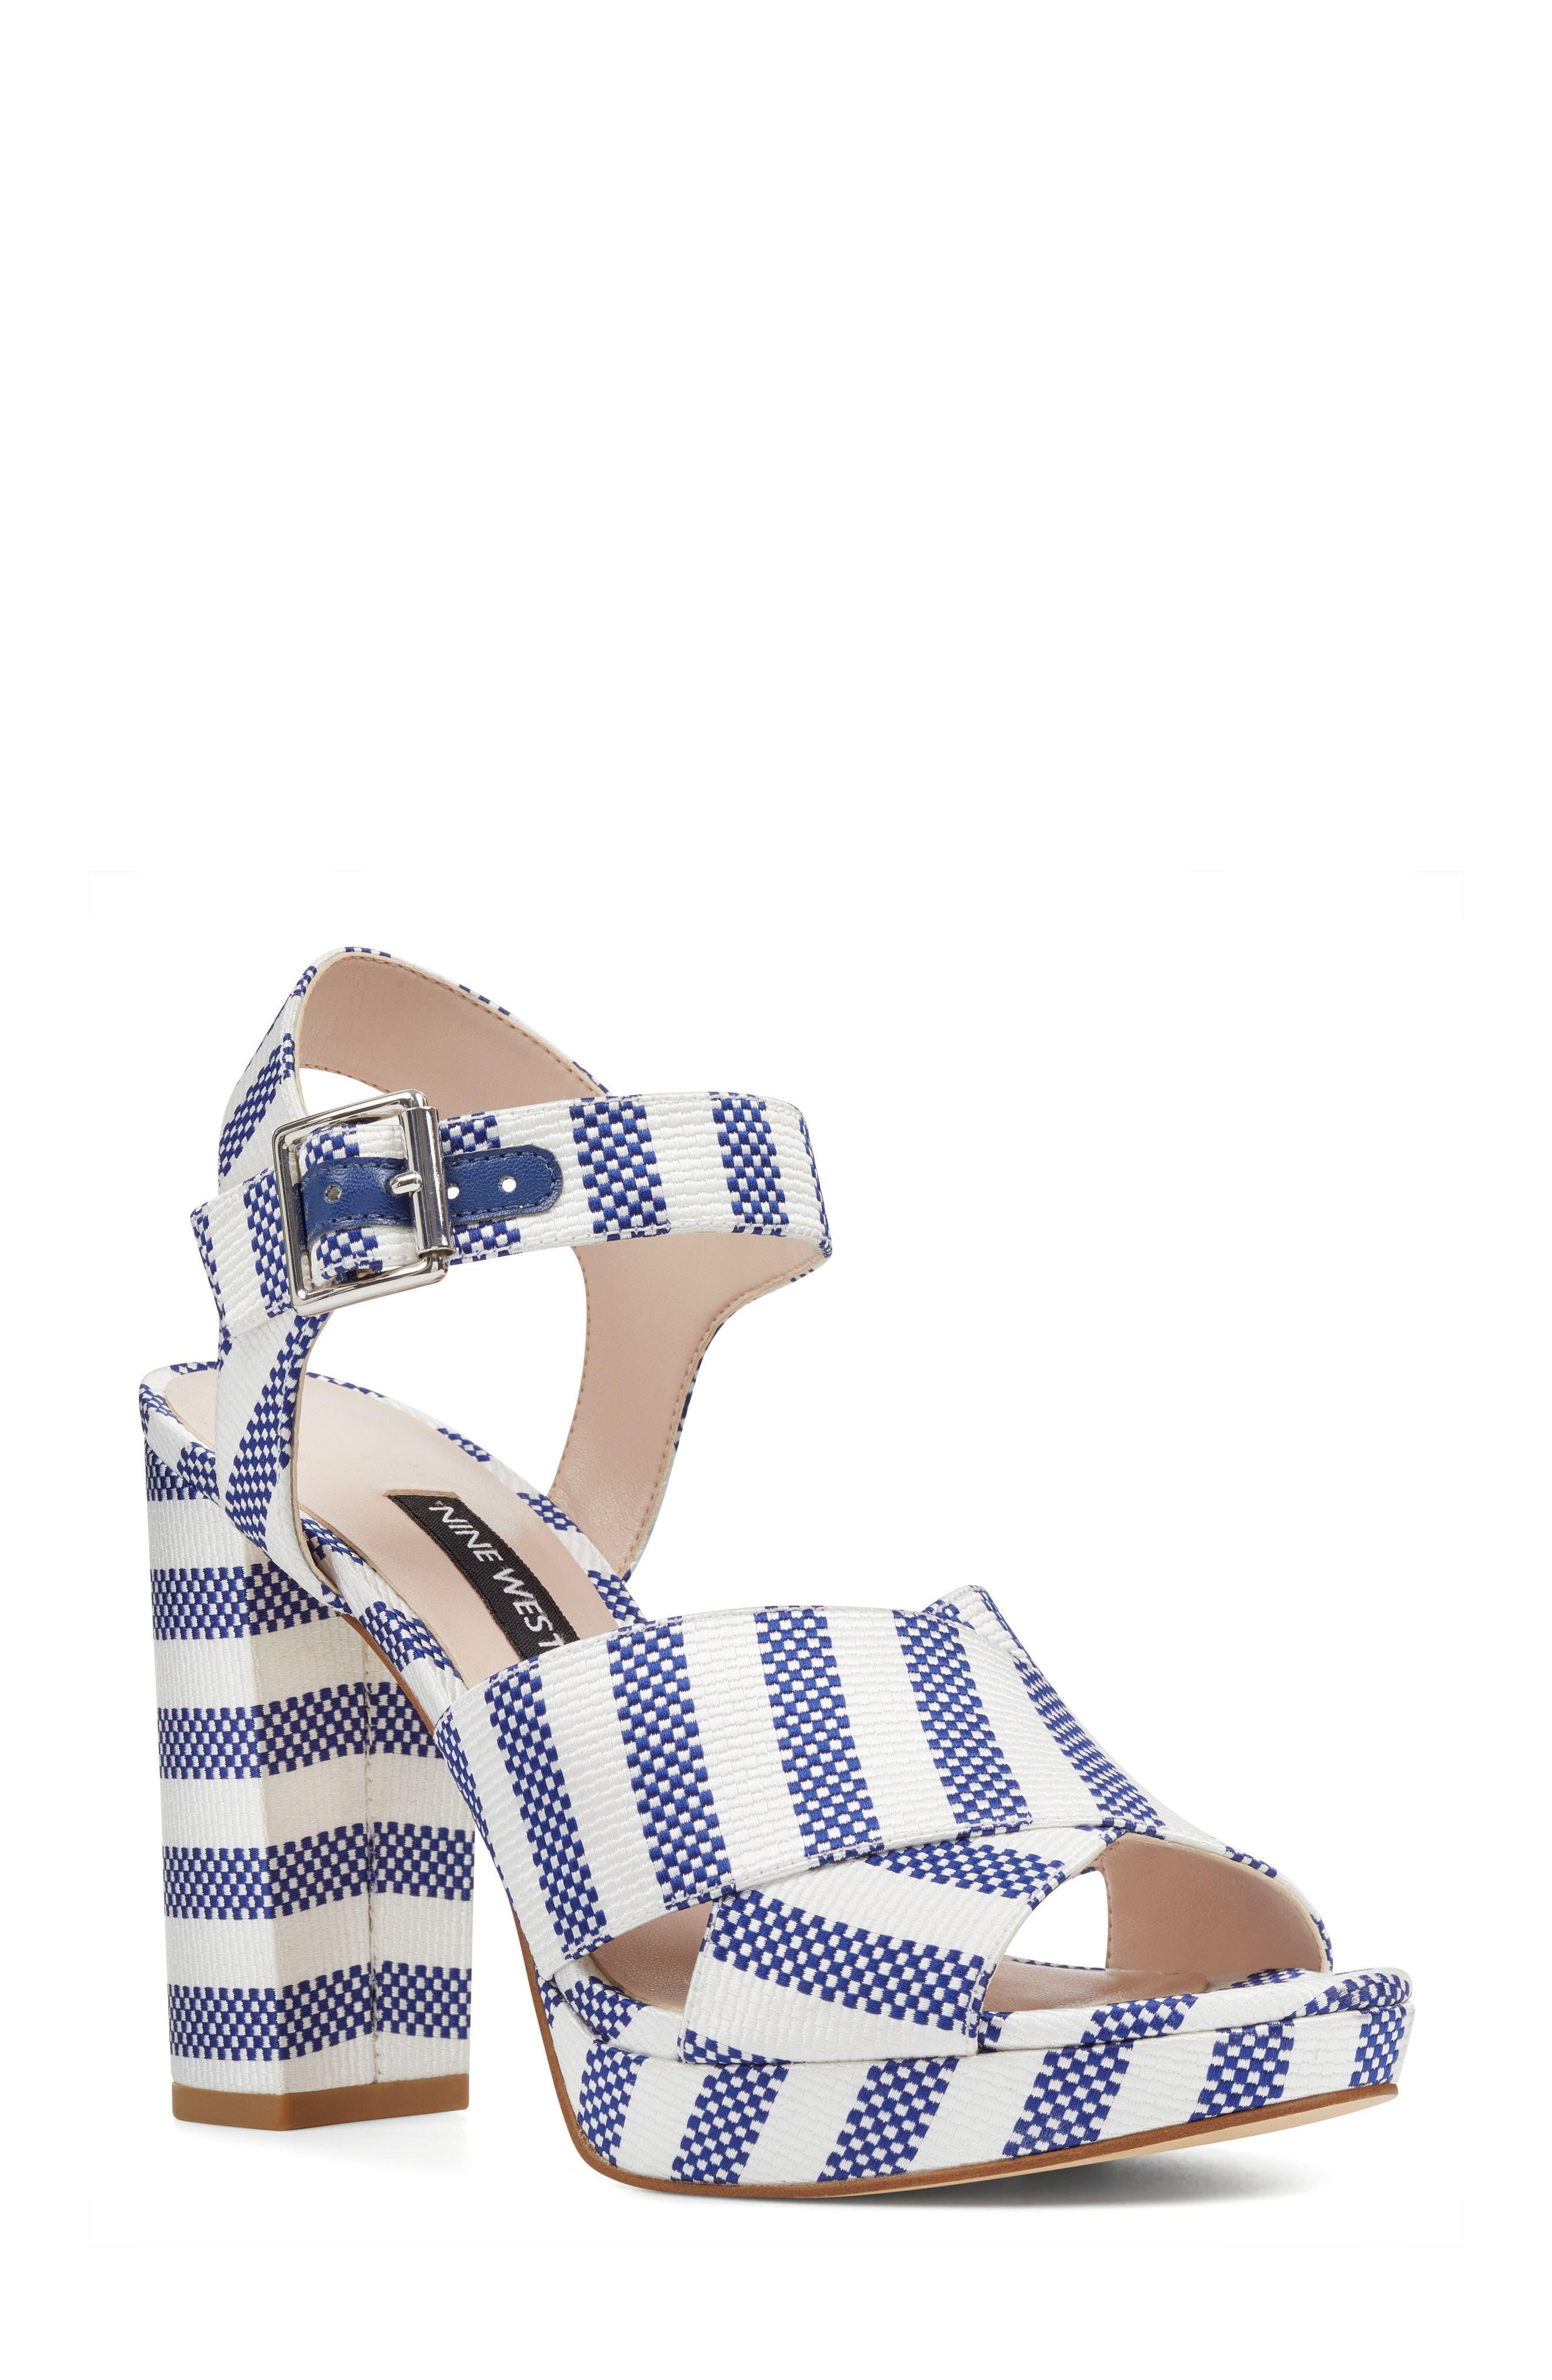 Main Image - Nine West Jimar Platform Sandal (Women)